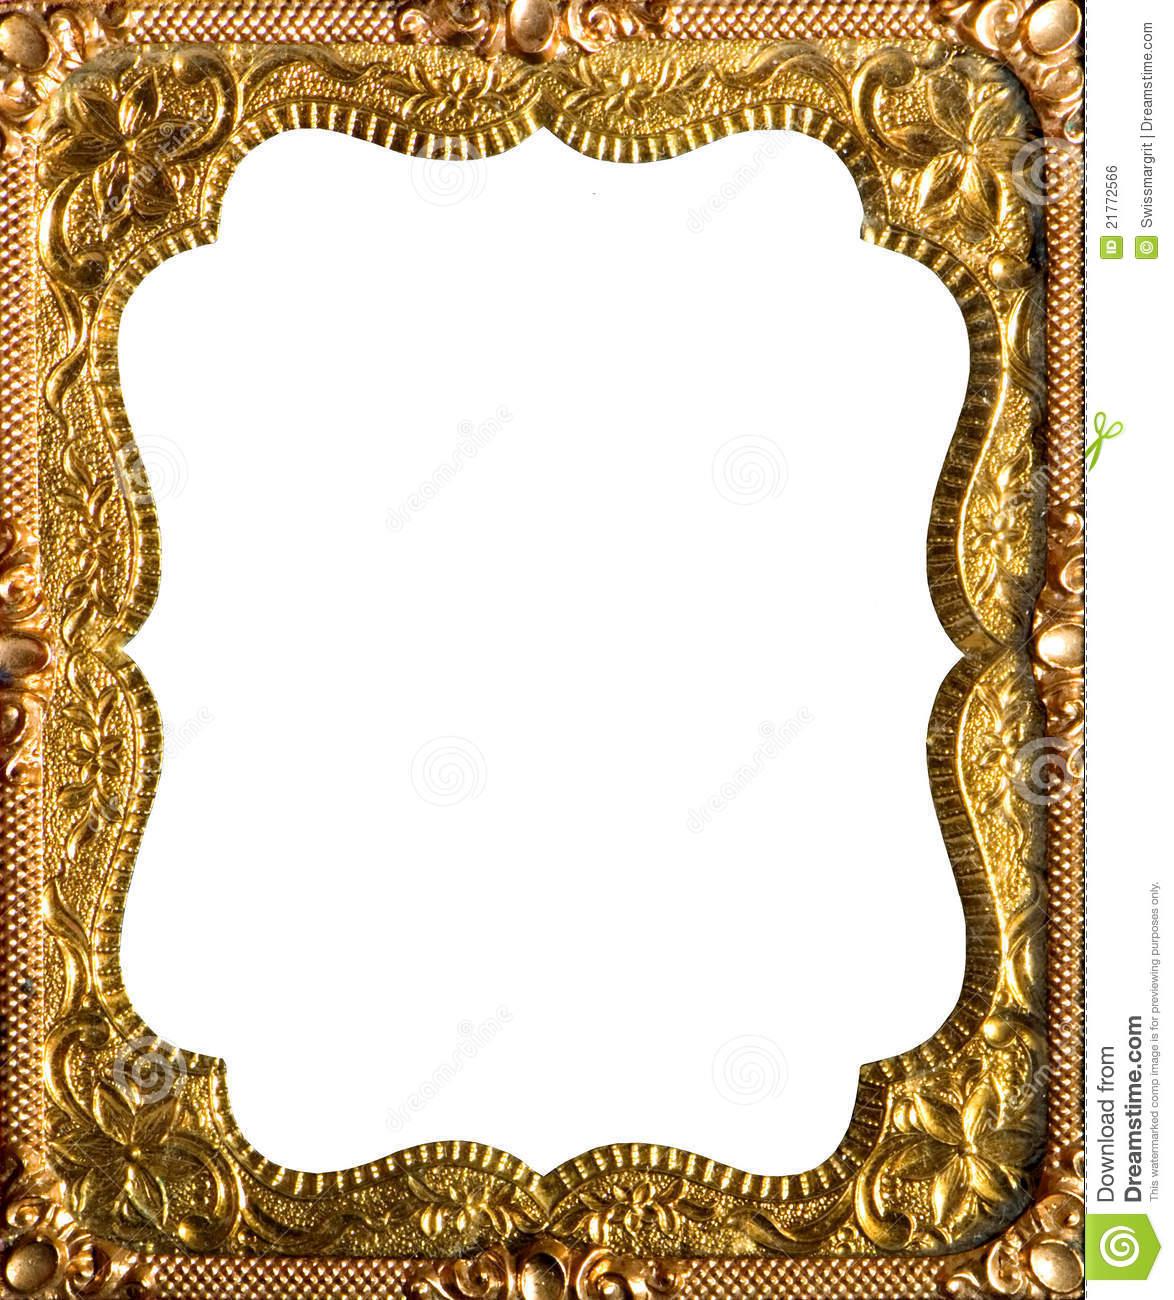 Clip art frames download.